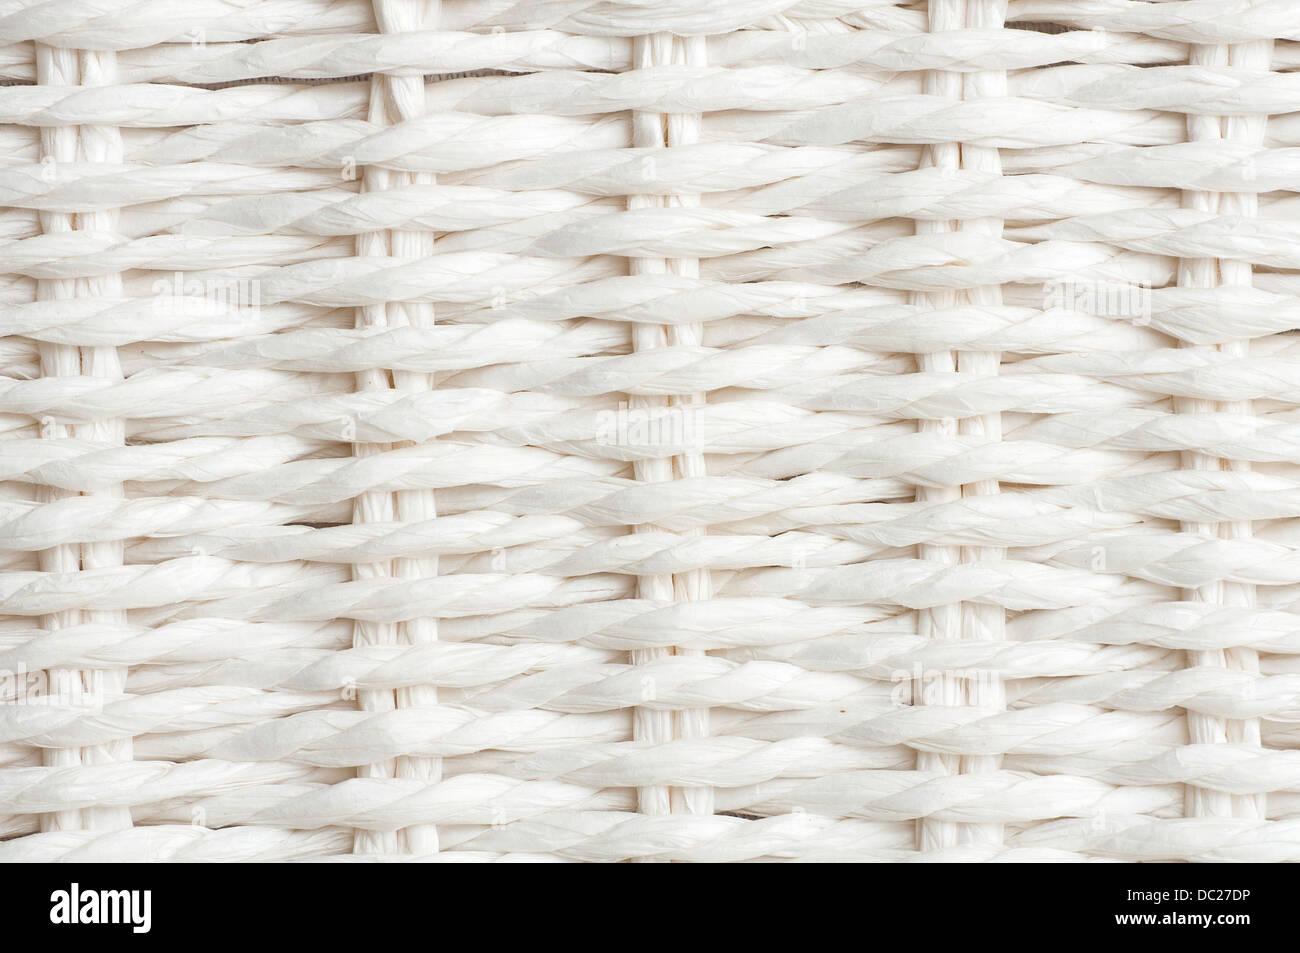 White lace braid - Stock Image